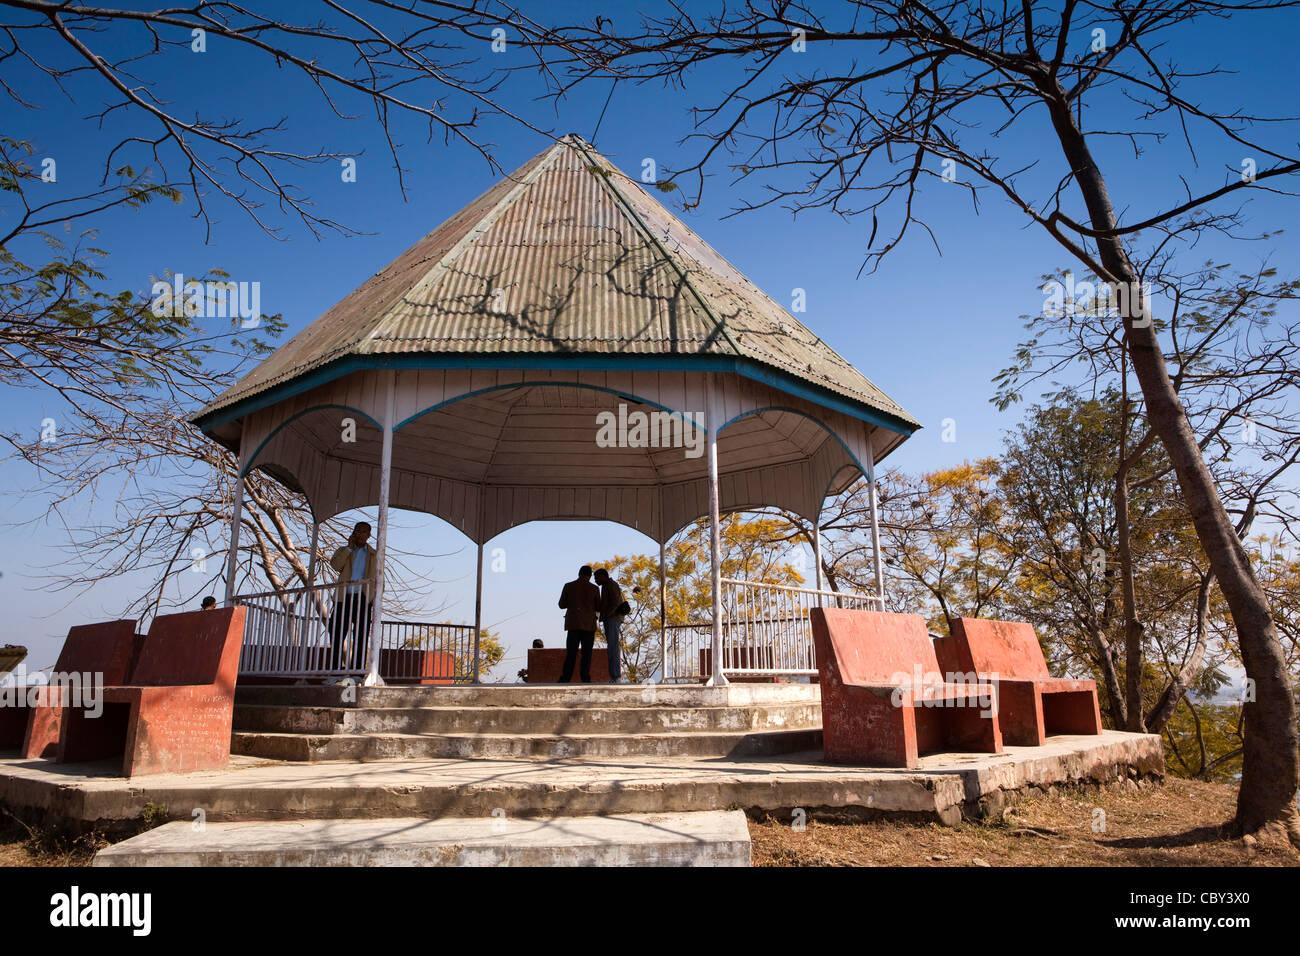 India, Manipur, Imphal, Loktak Lake, Sendra Island viewpoint - Stock Image